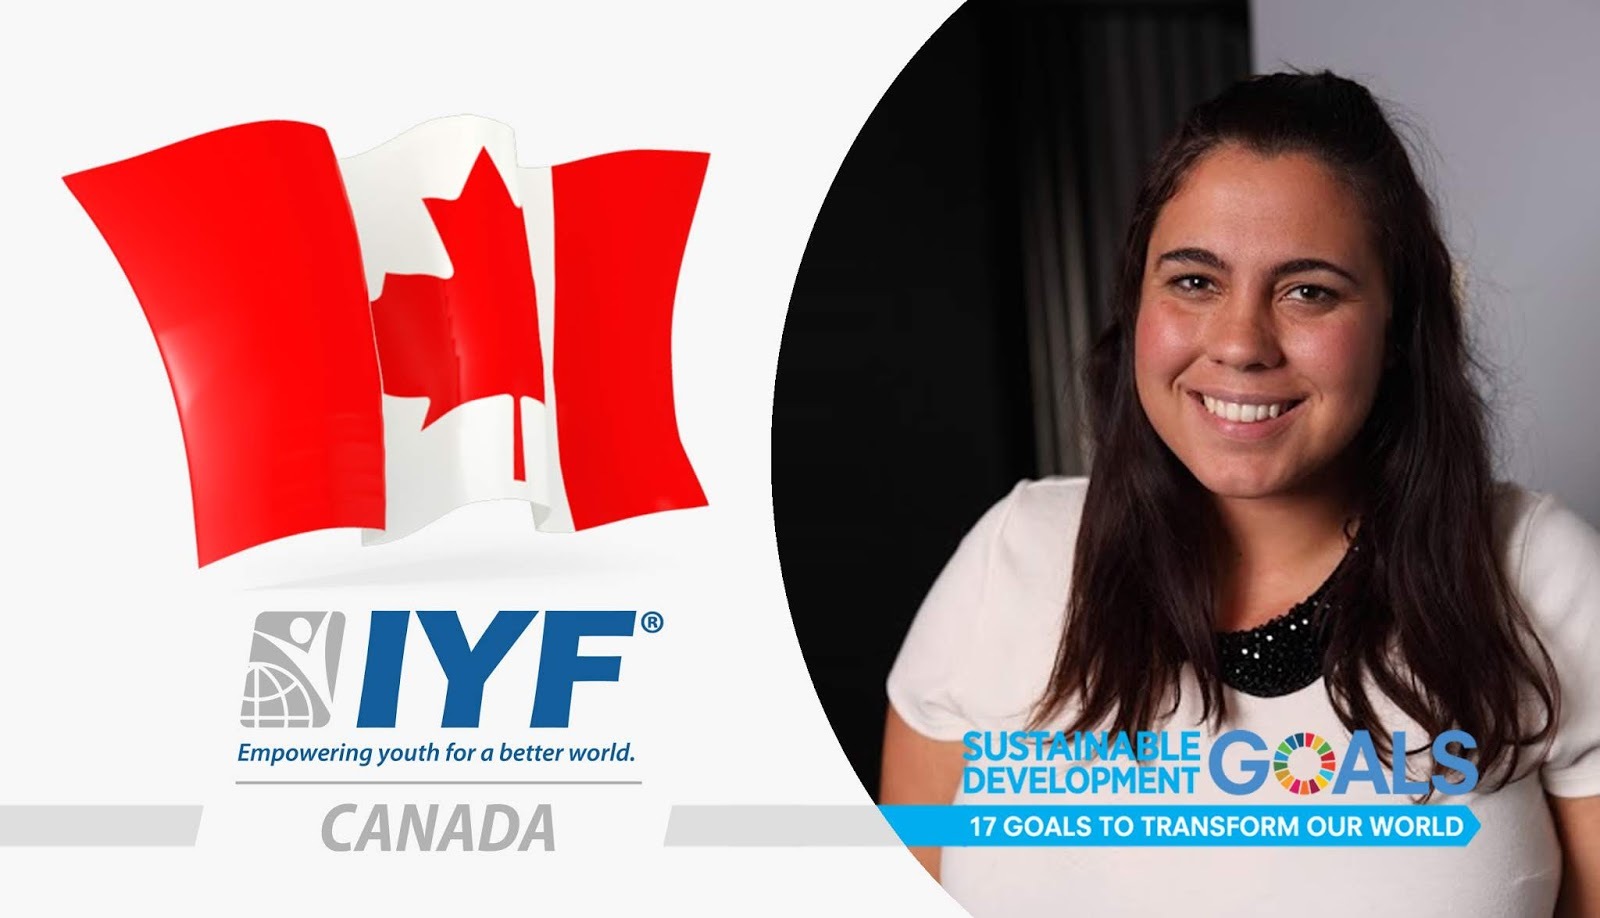 Melissa Fairey, IYF Representative in Canada